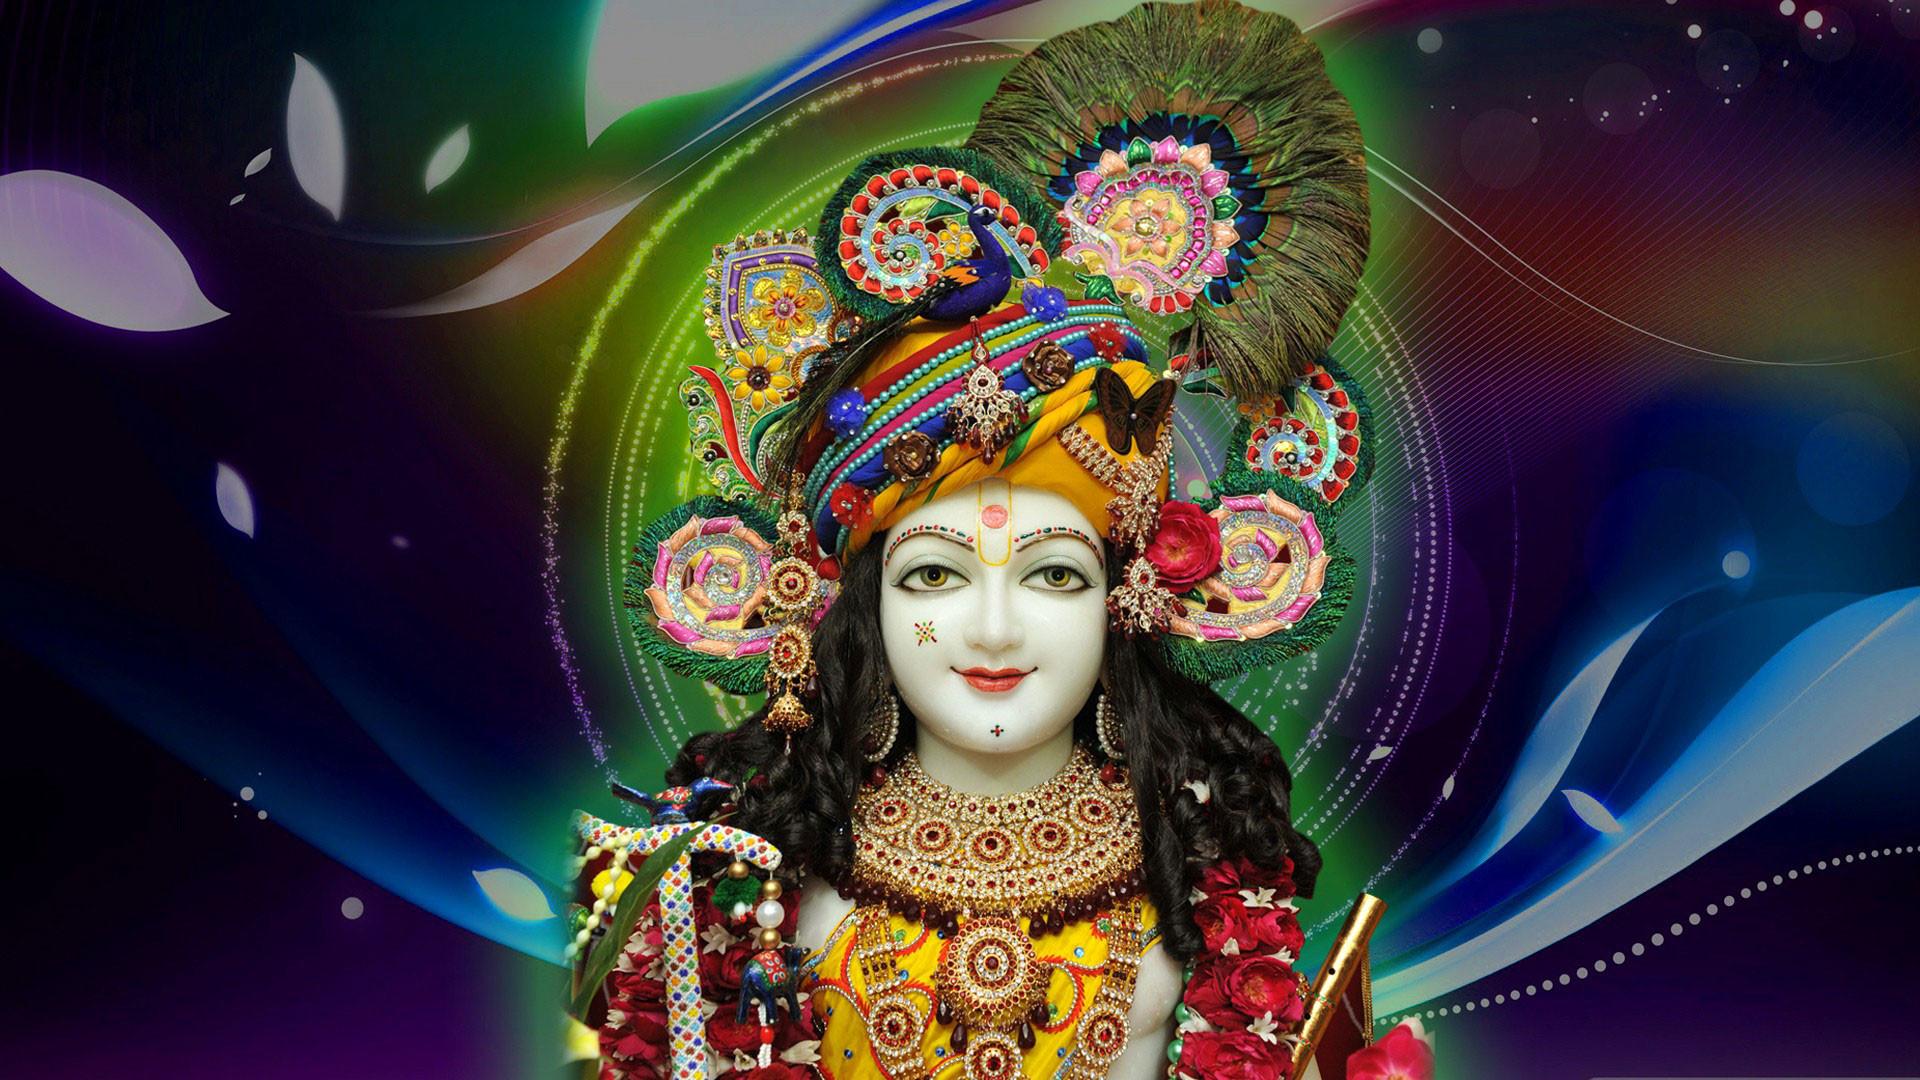 Baps Ghanshyam Maharaj Hd Wallpaper God Wallpapers 183 ①